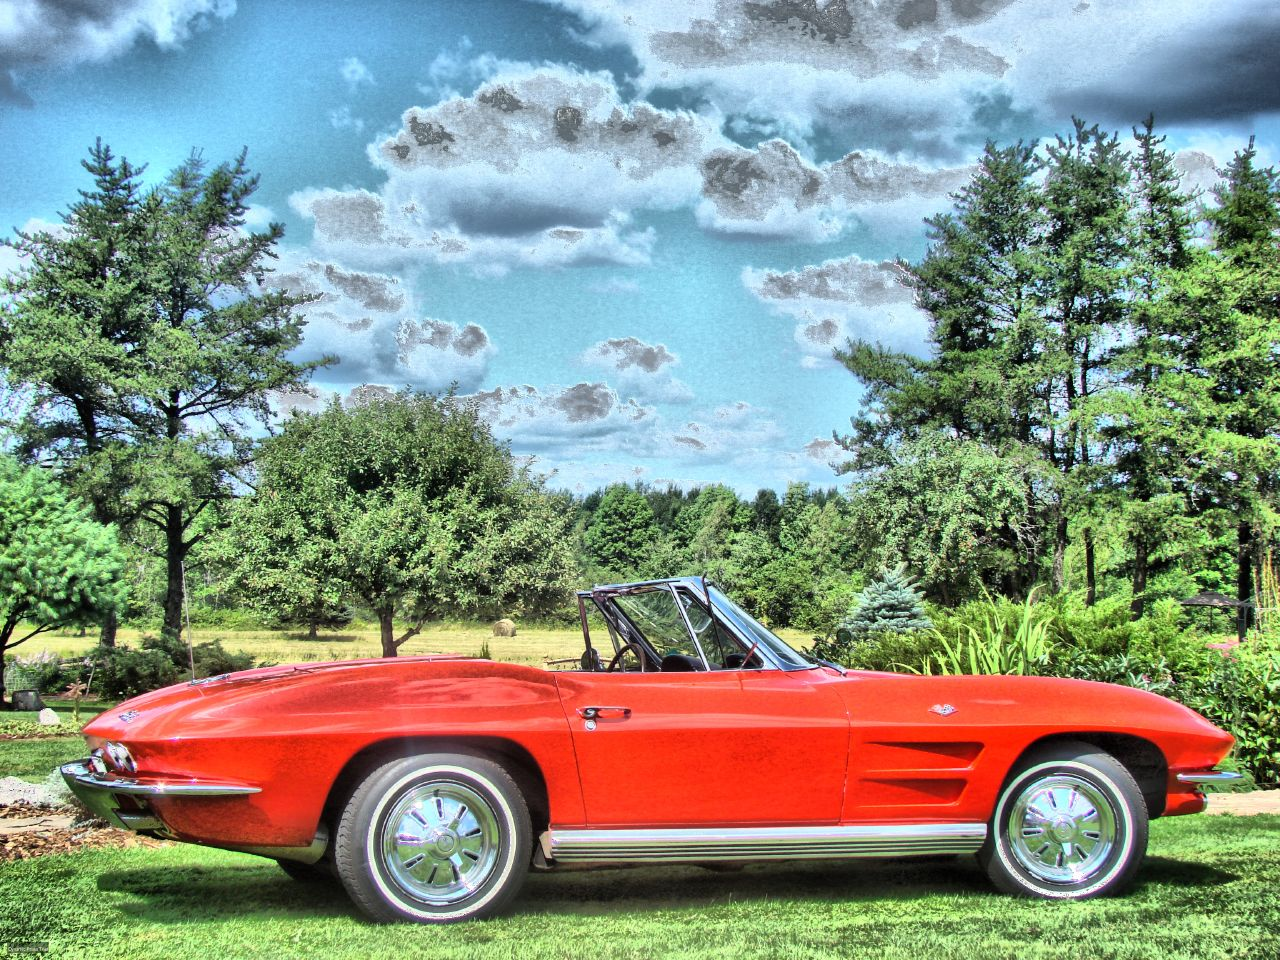 Kevin's 1964 Corvette roadster in HDR